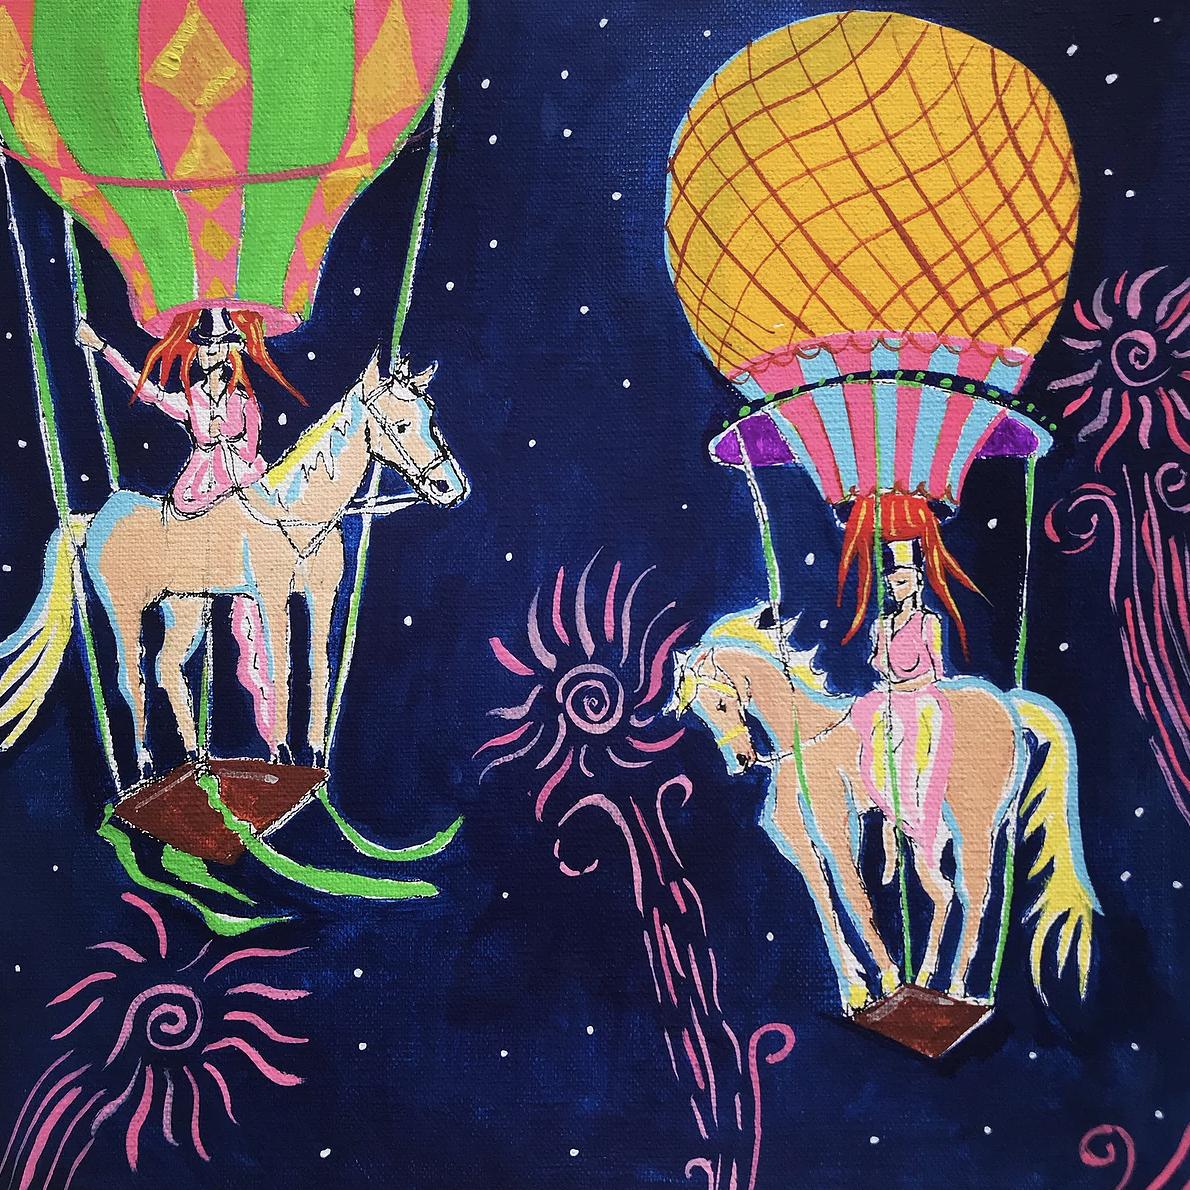 The Balloon Travelers